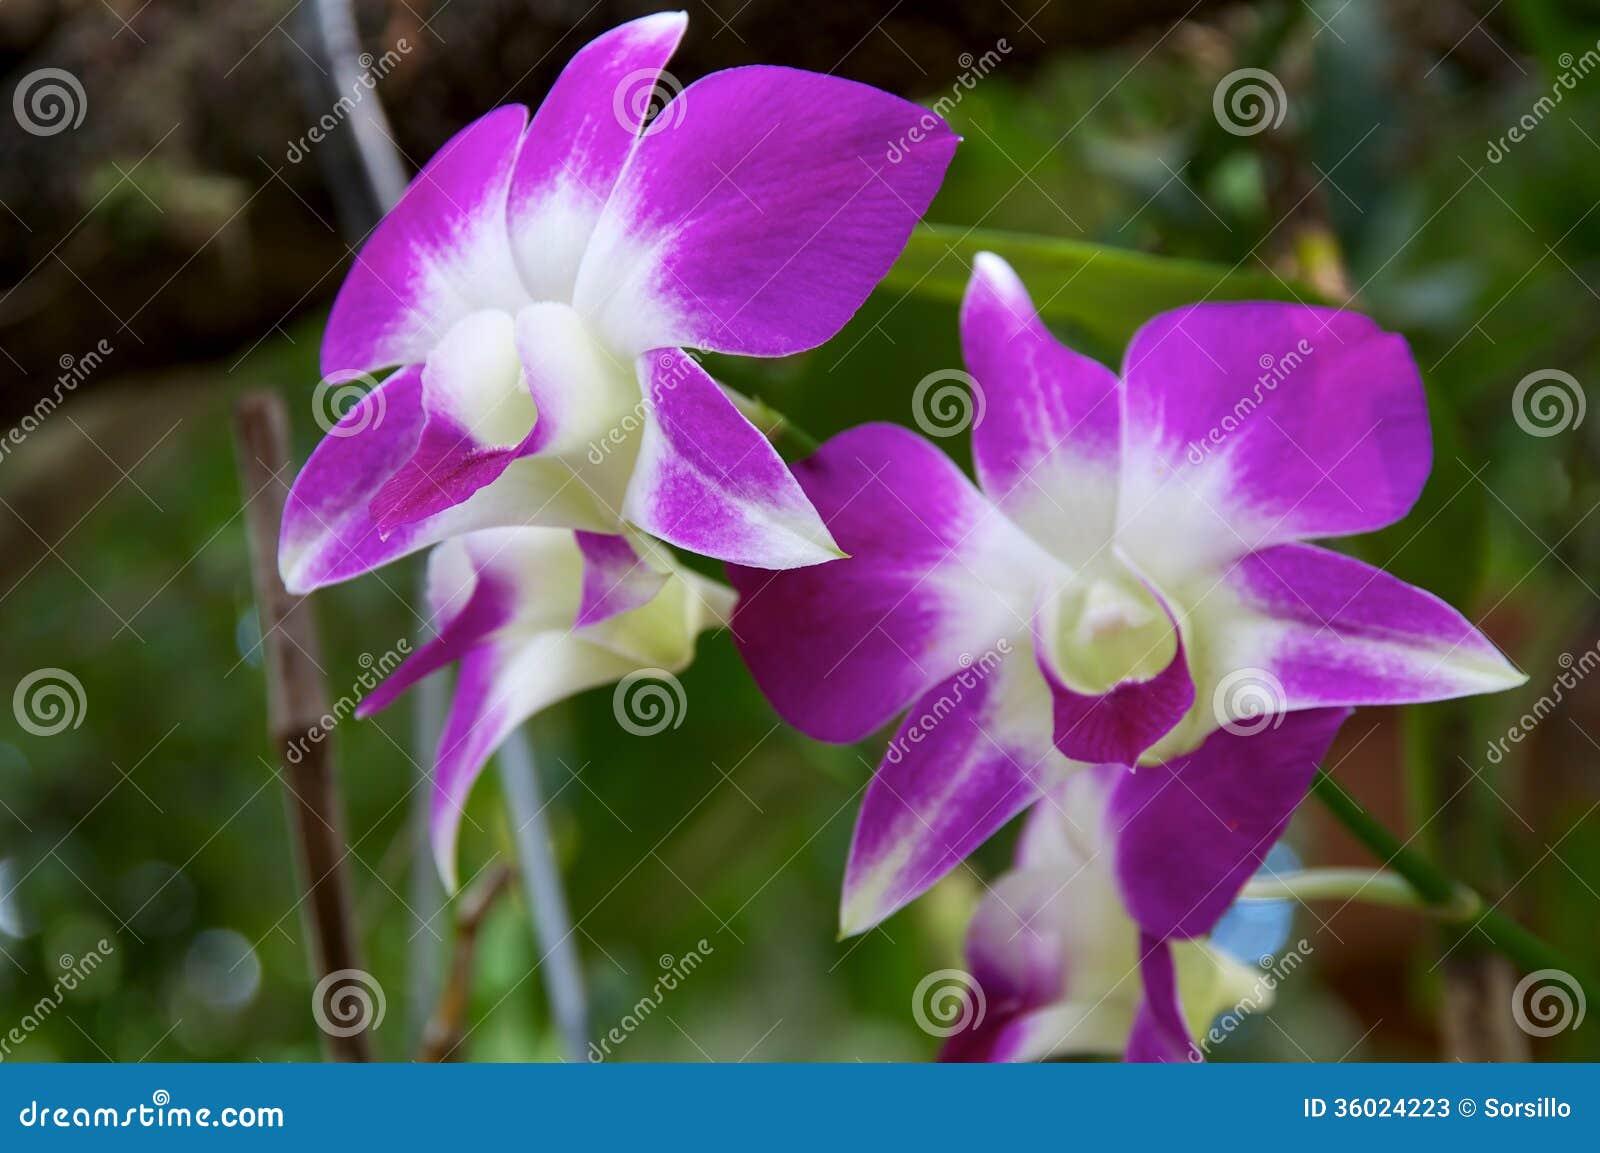 of purple white - photo #39